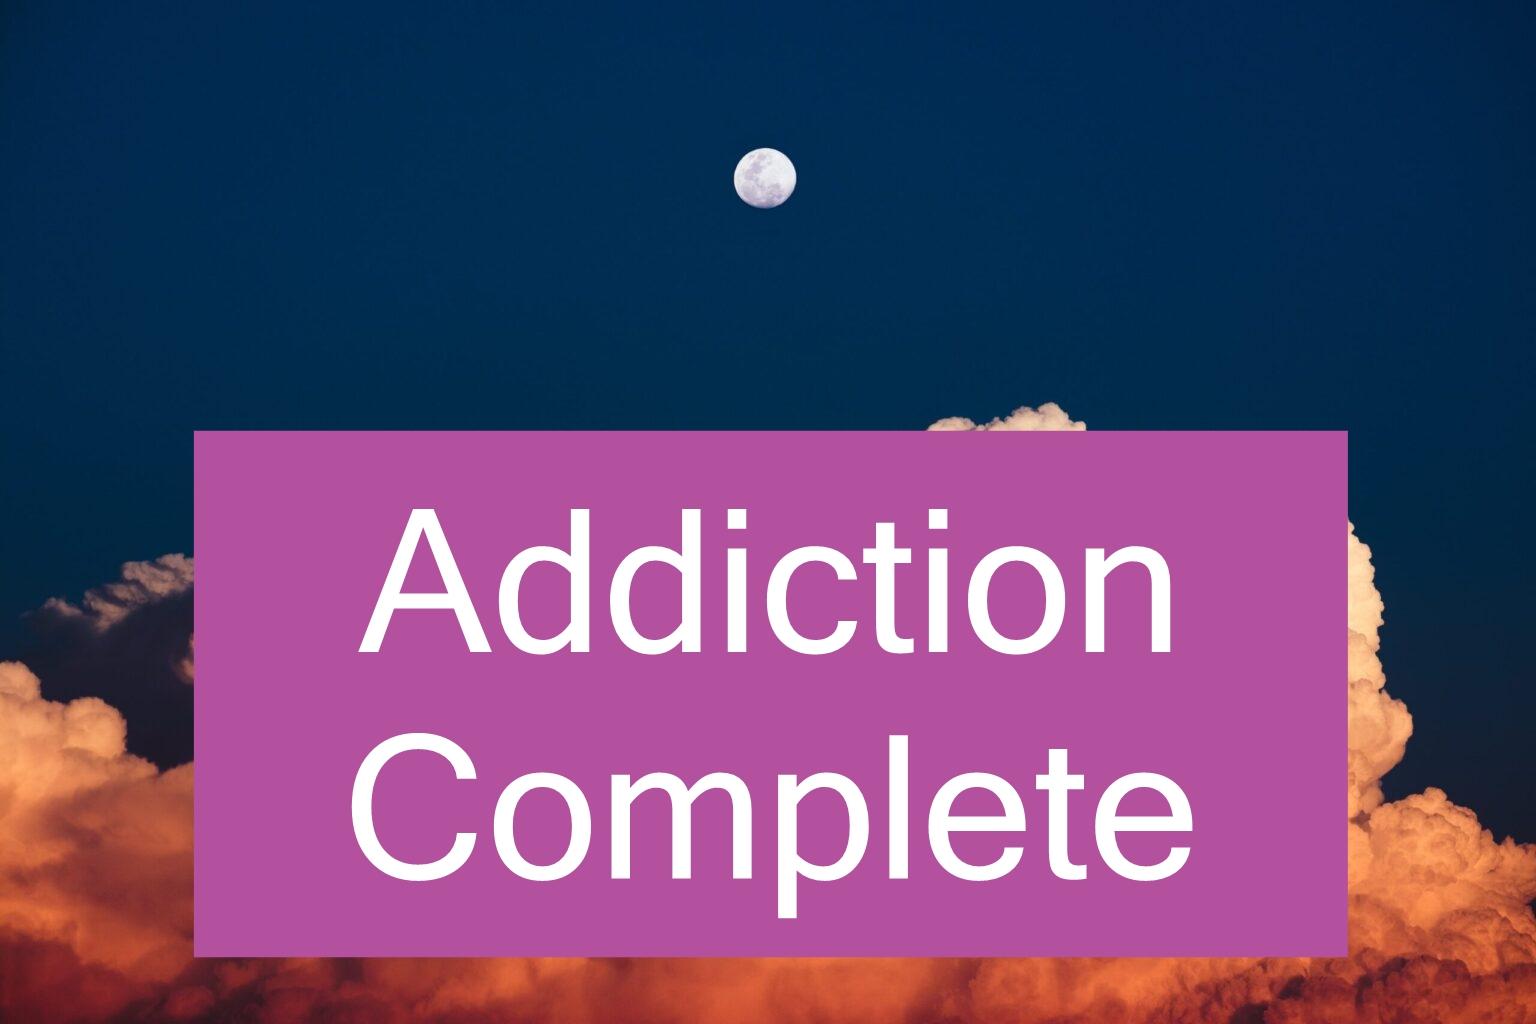 addiction complete